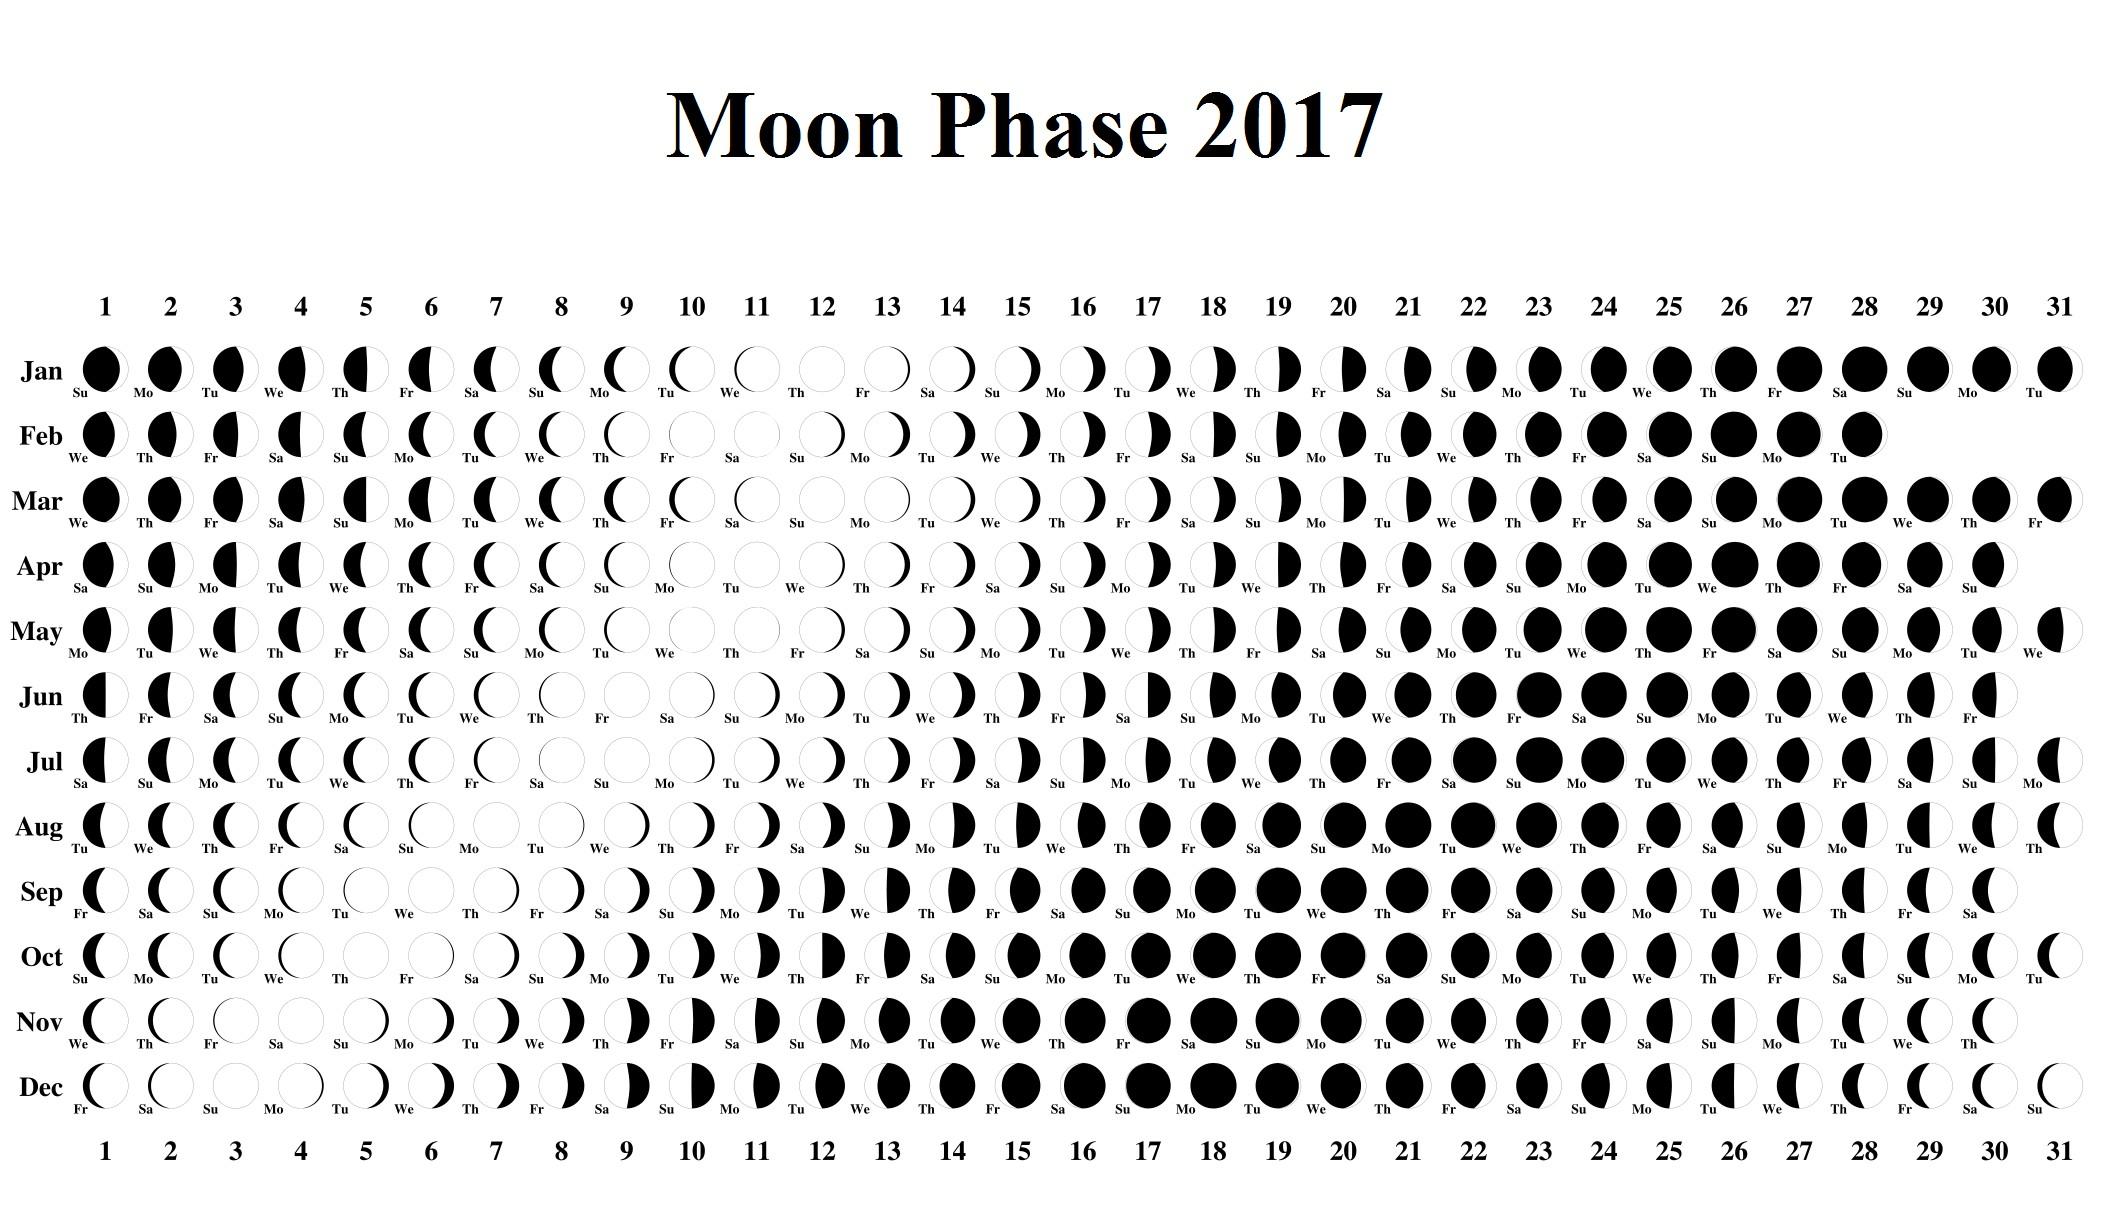 Full Moon Calendar September 2018 | Calendar Template in Template For Lunar Calendar